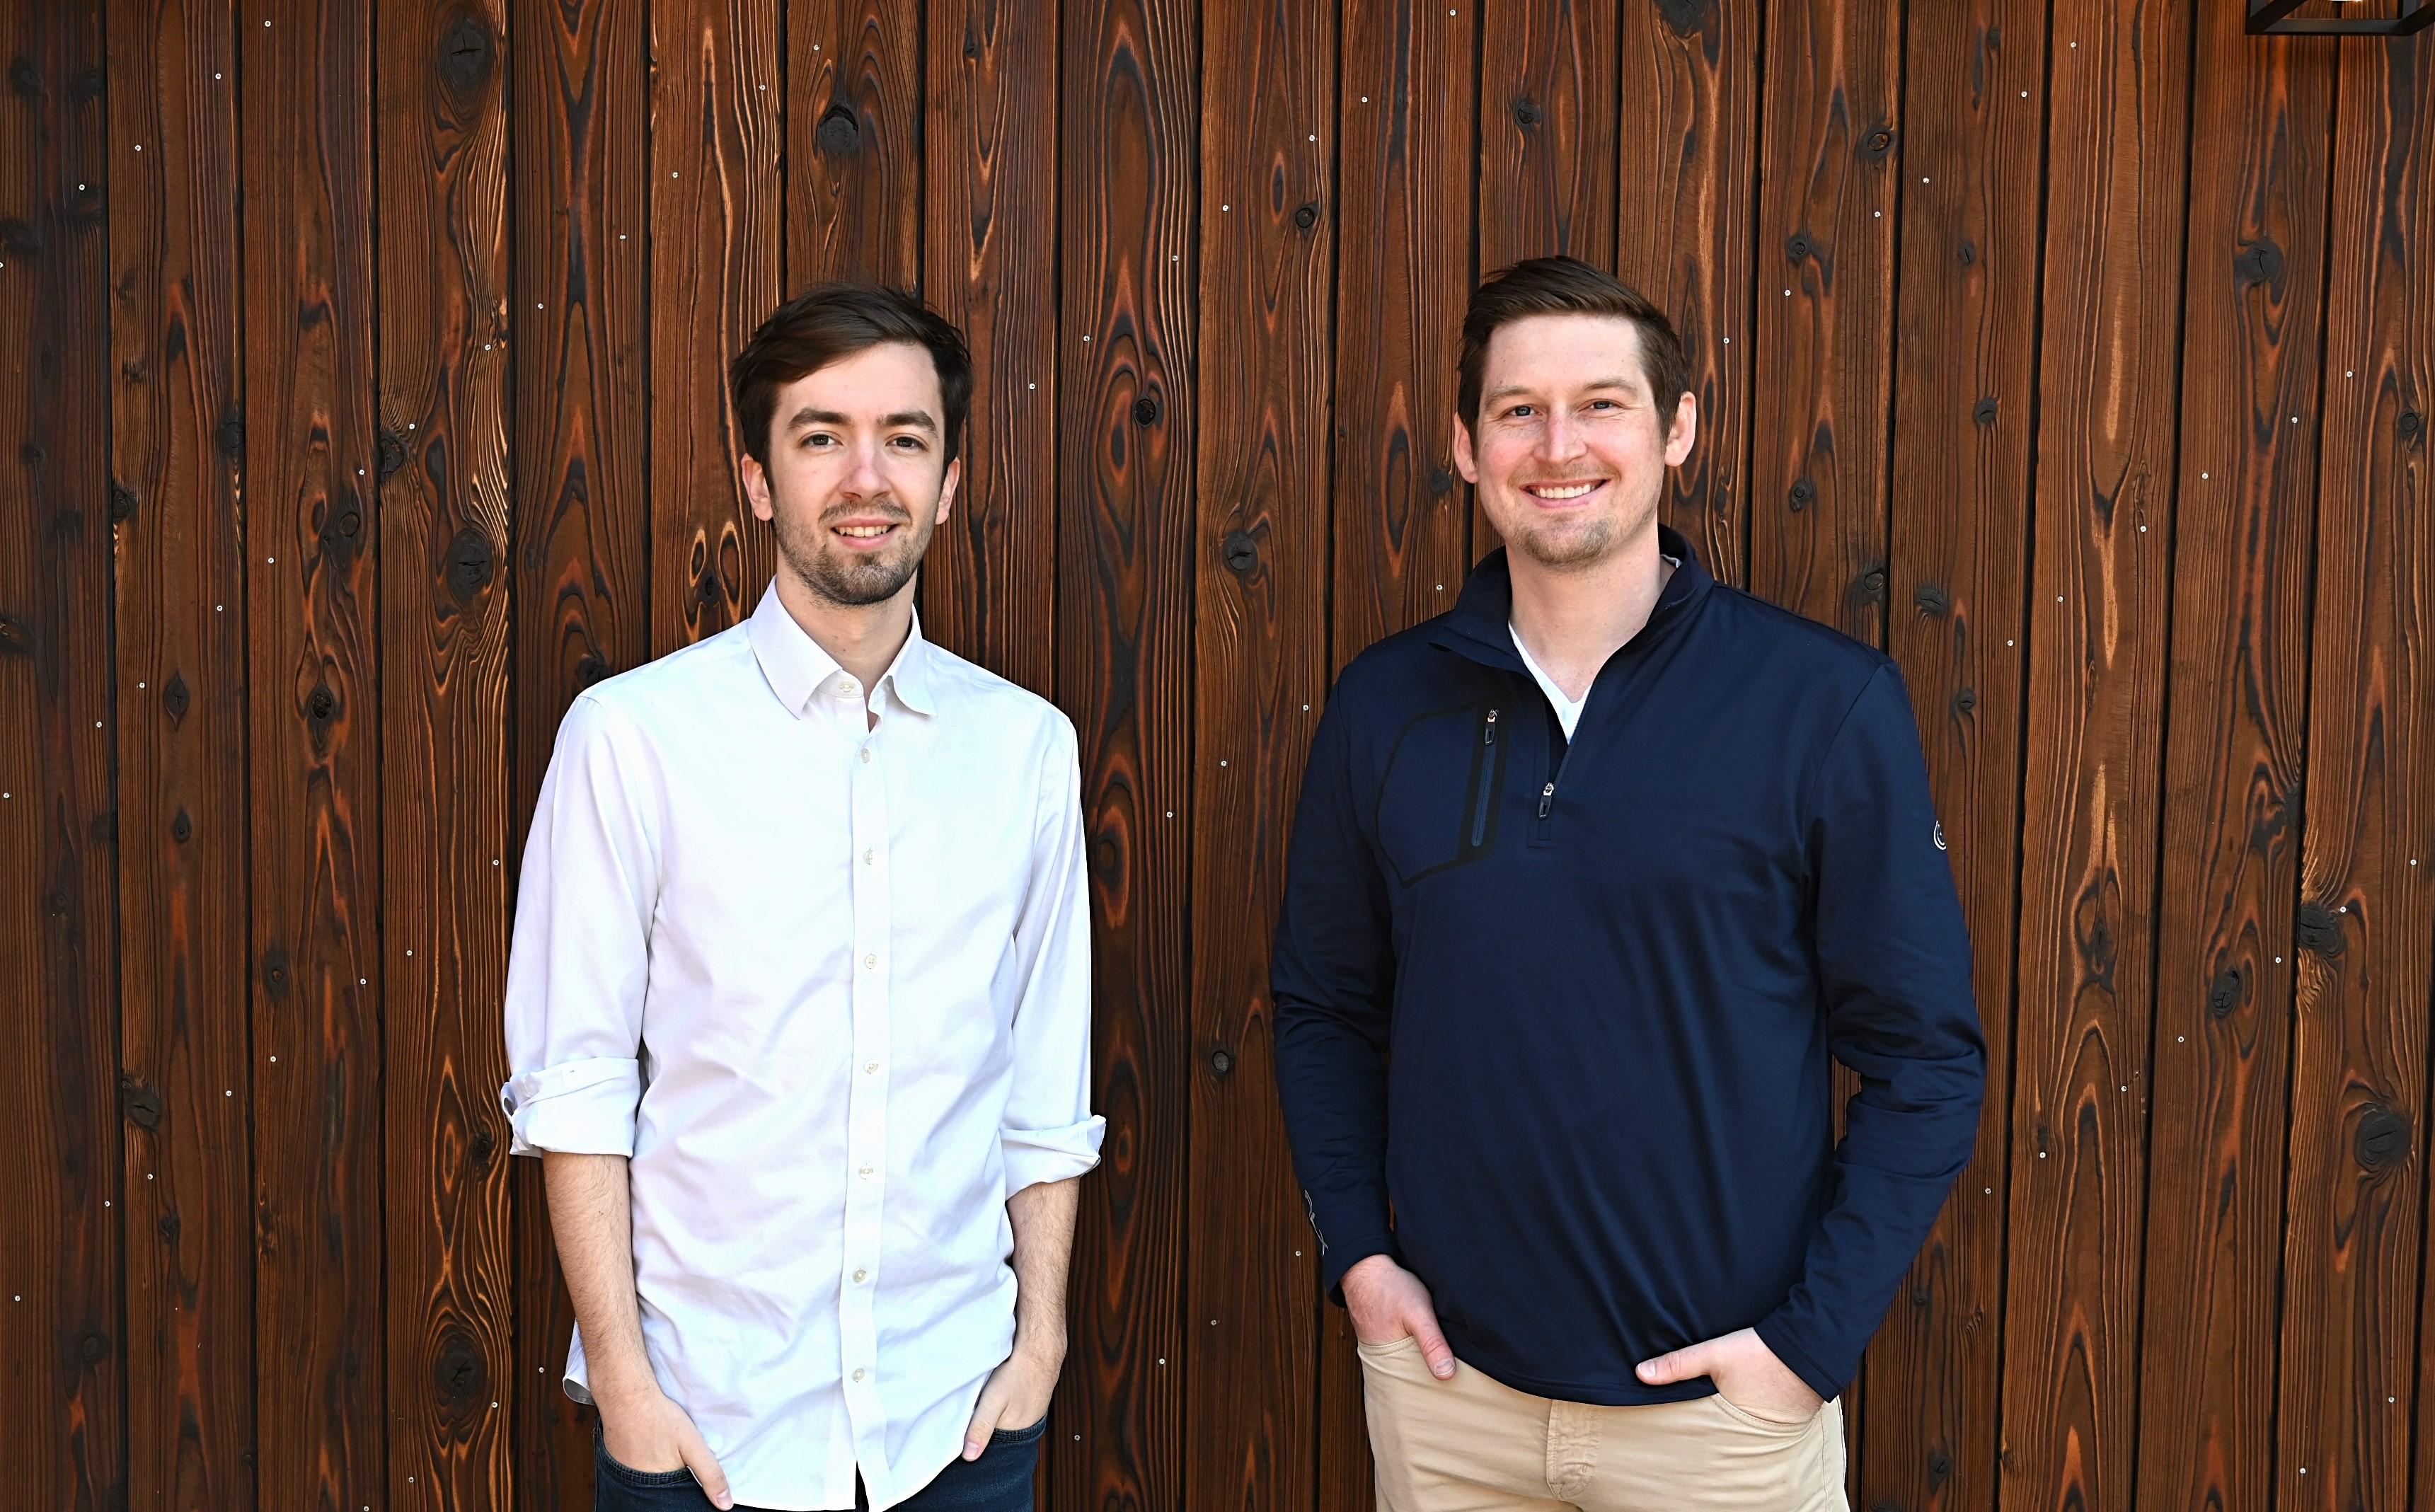 IoT connectivity startup Teal Communications raises $9.1M